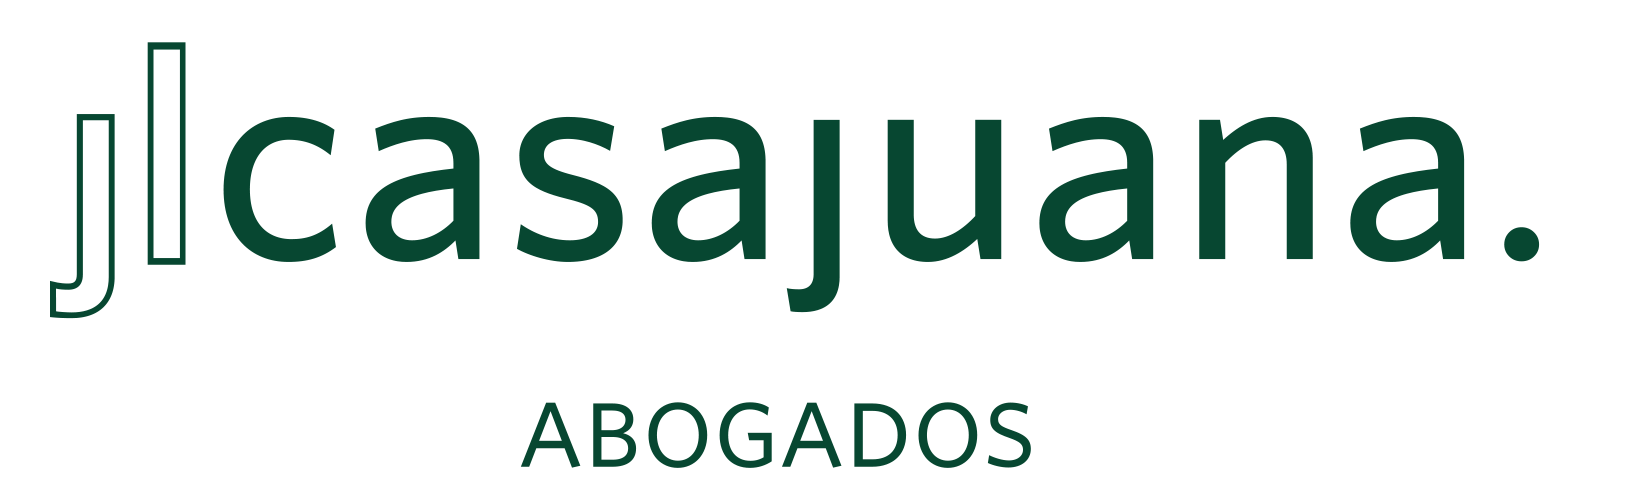 JL Casajuana Abogados